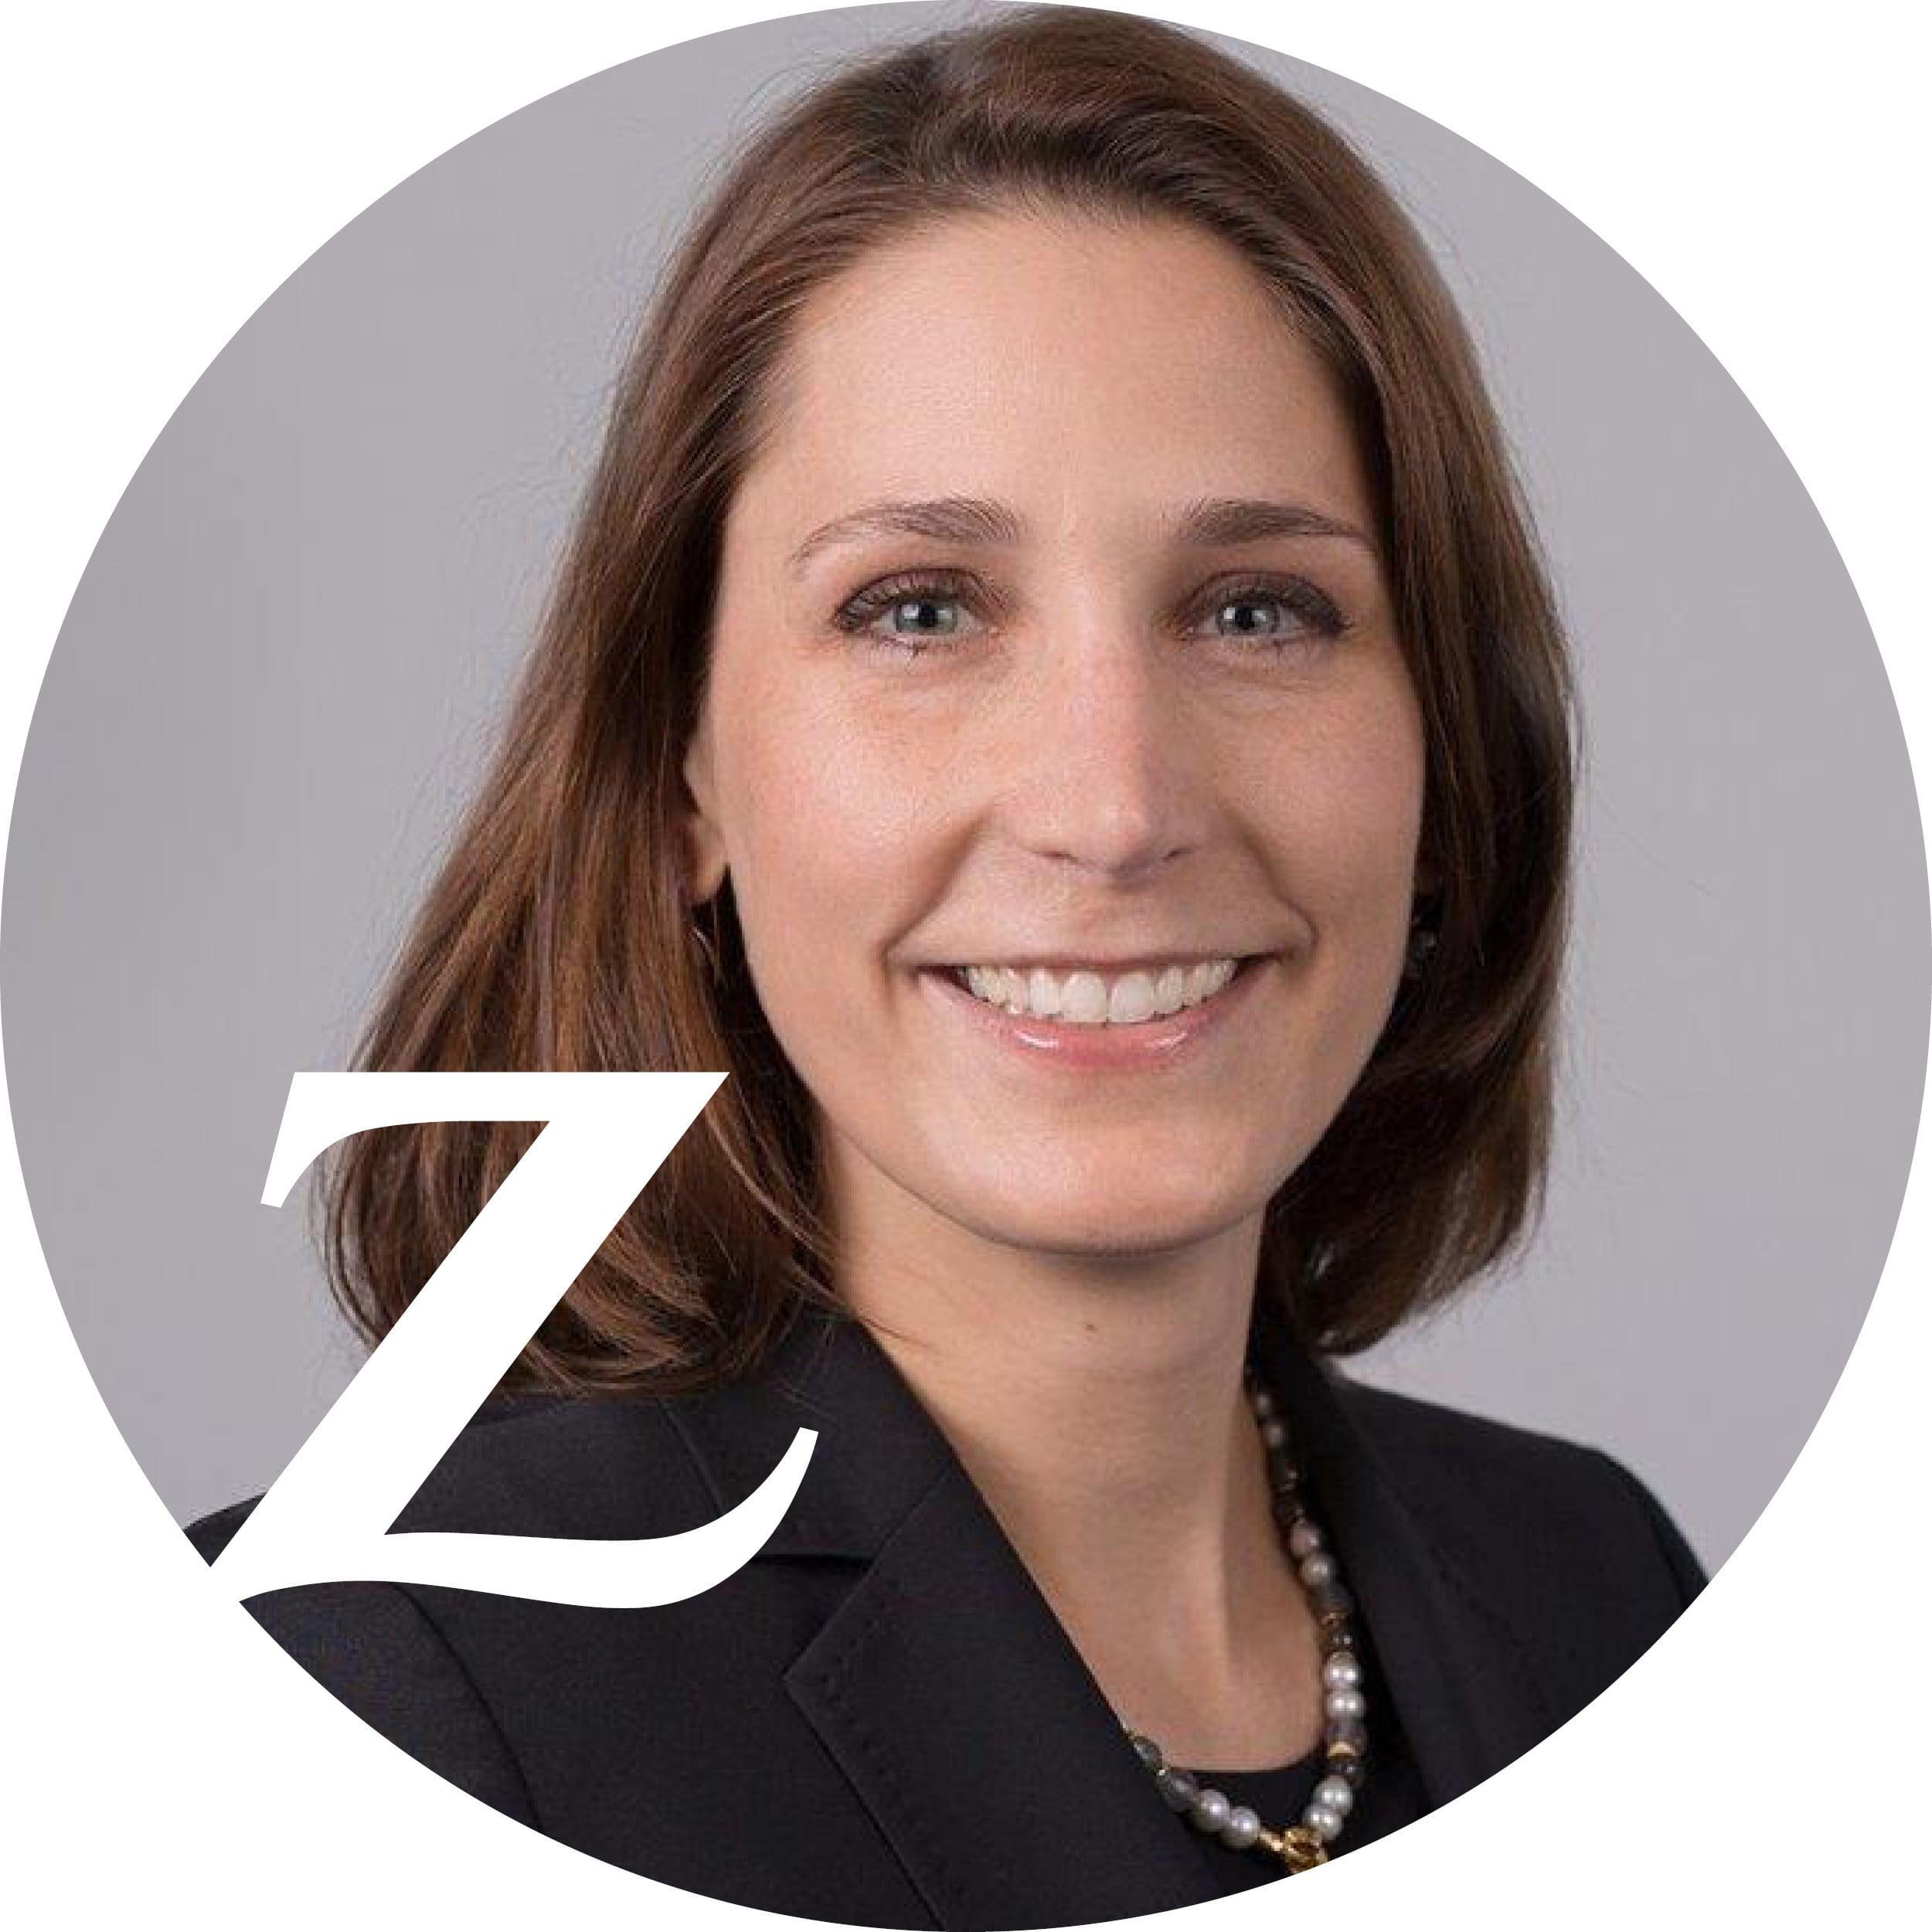 Claudia Flury, Chief Risk Officer